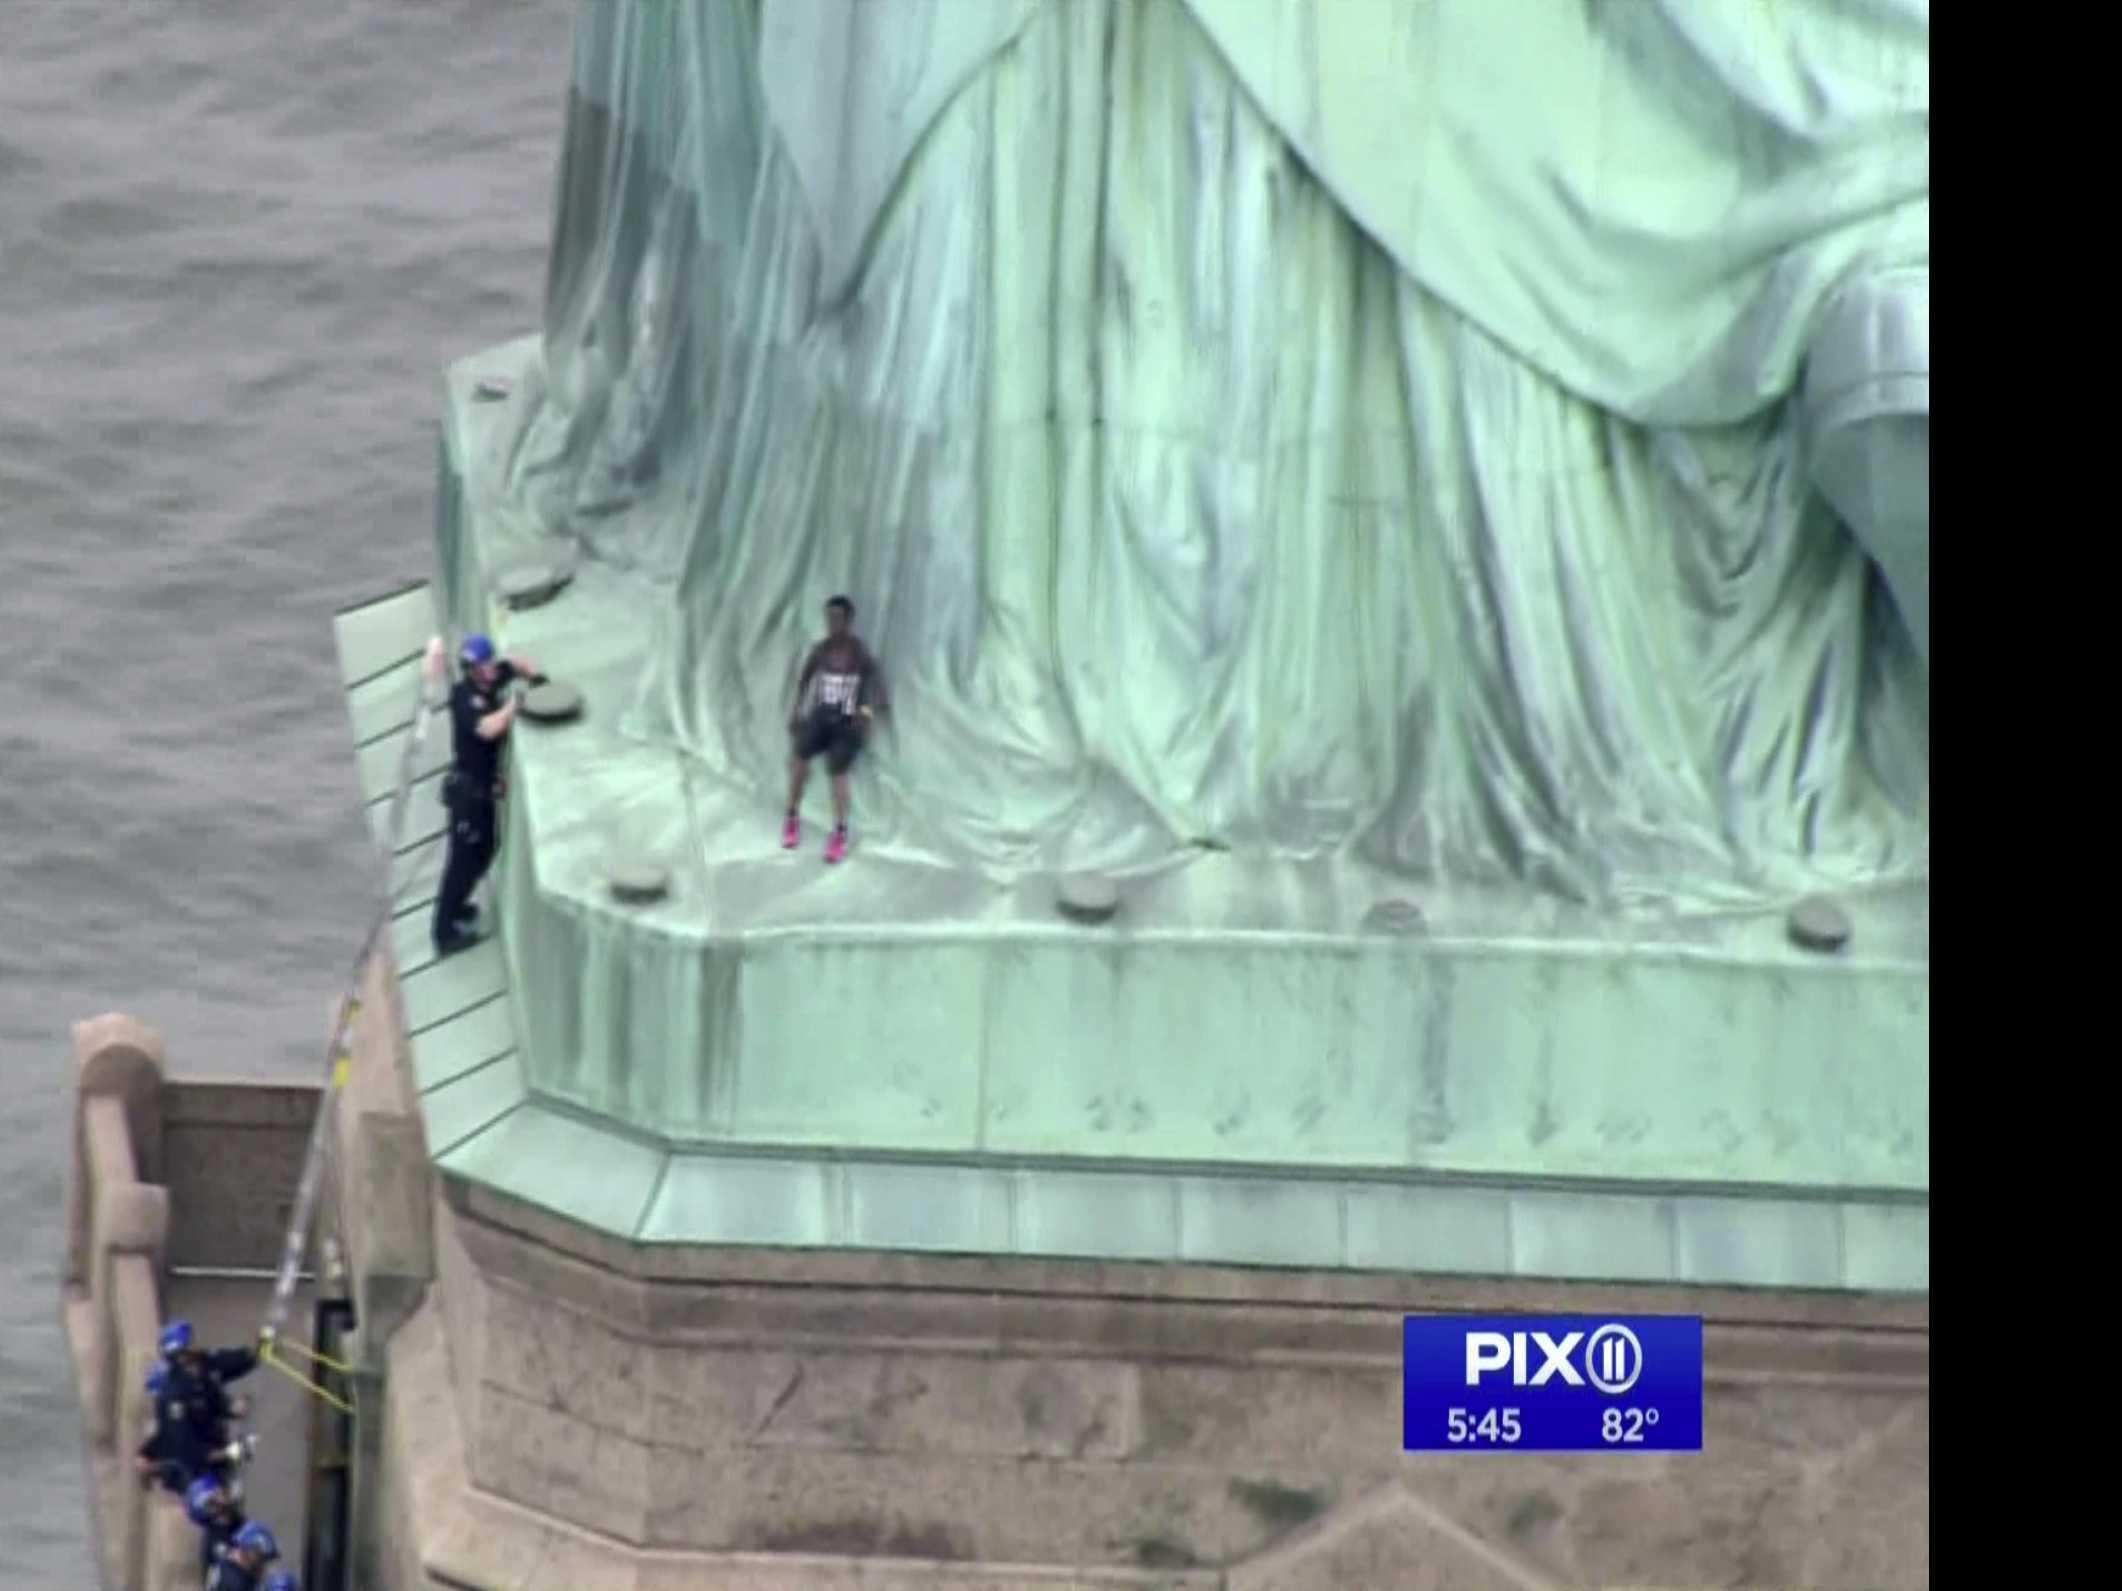 Statue Of Liberty Climber Awaits Court Appearance